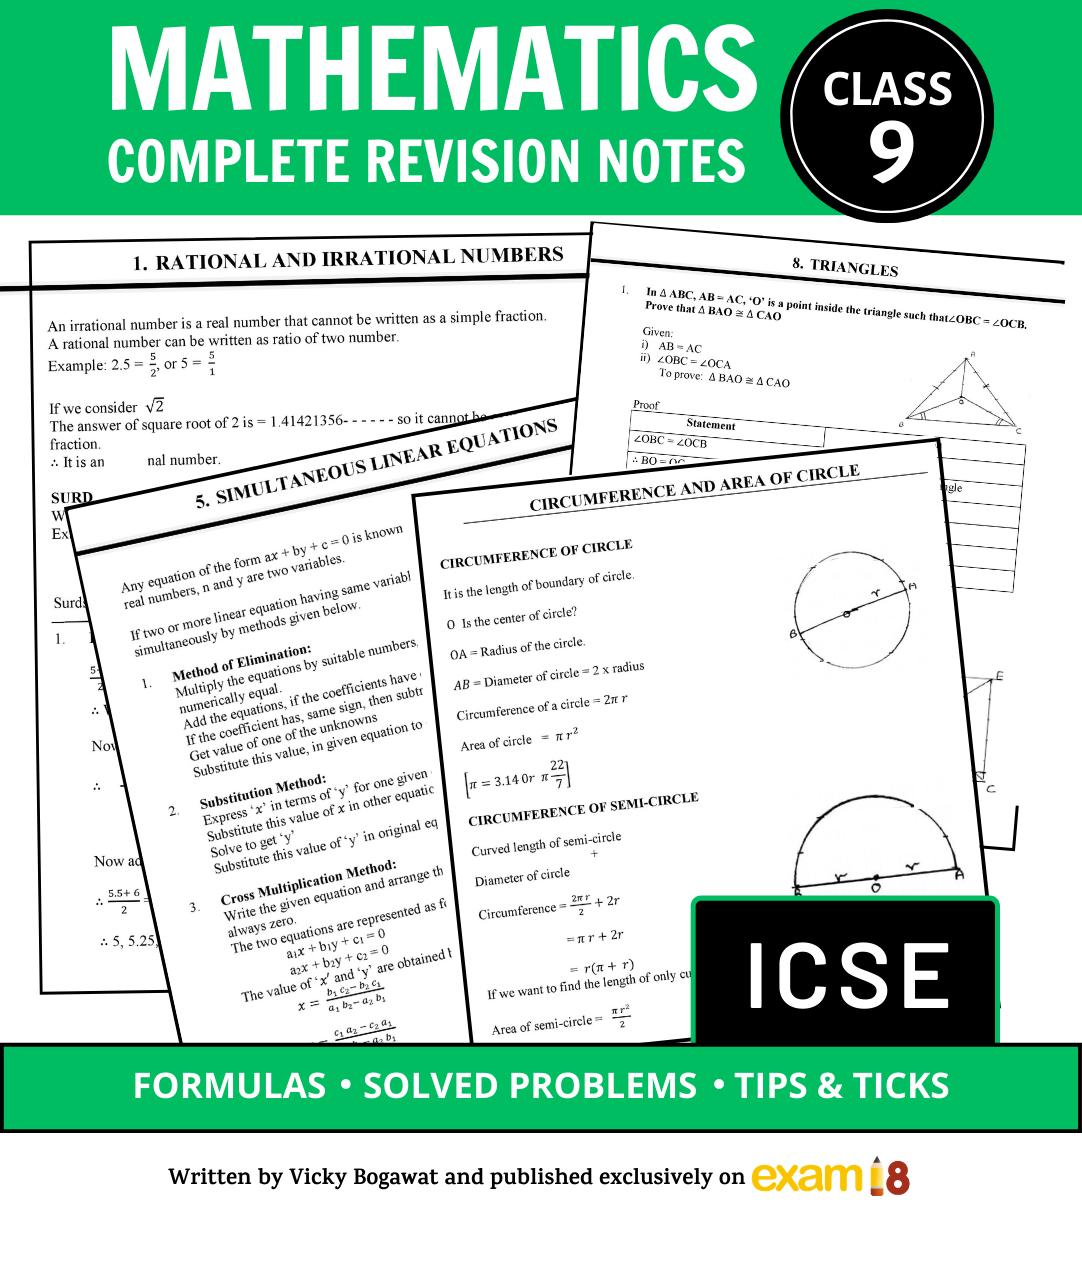 Exam18 Icse Class 9 Maths Complete Revision Notes Strengthen Concepts Learn Formulas Practice Q A Exam18 Math Books Math Maths Exam [ 1272 x 1082 Pixel ]